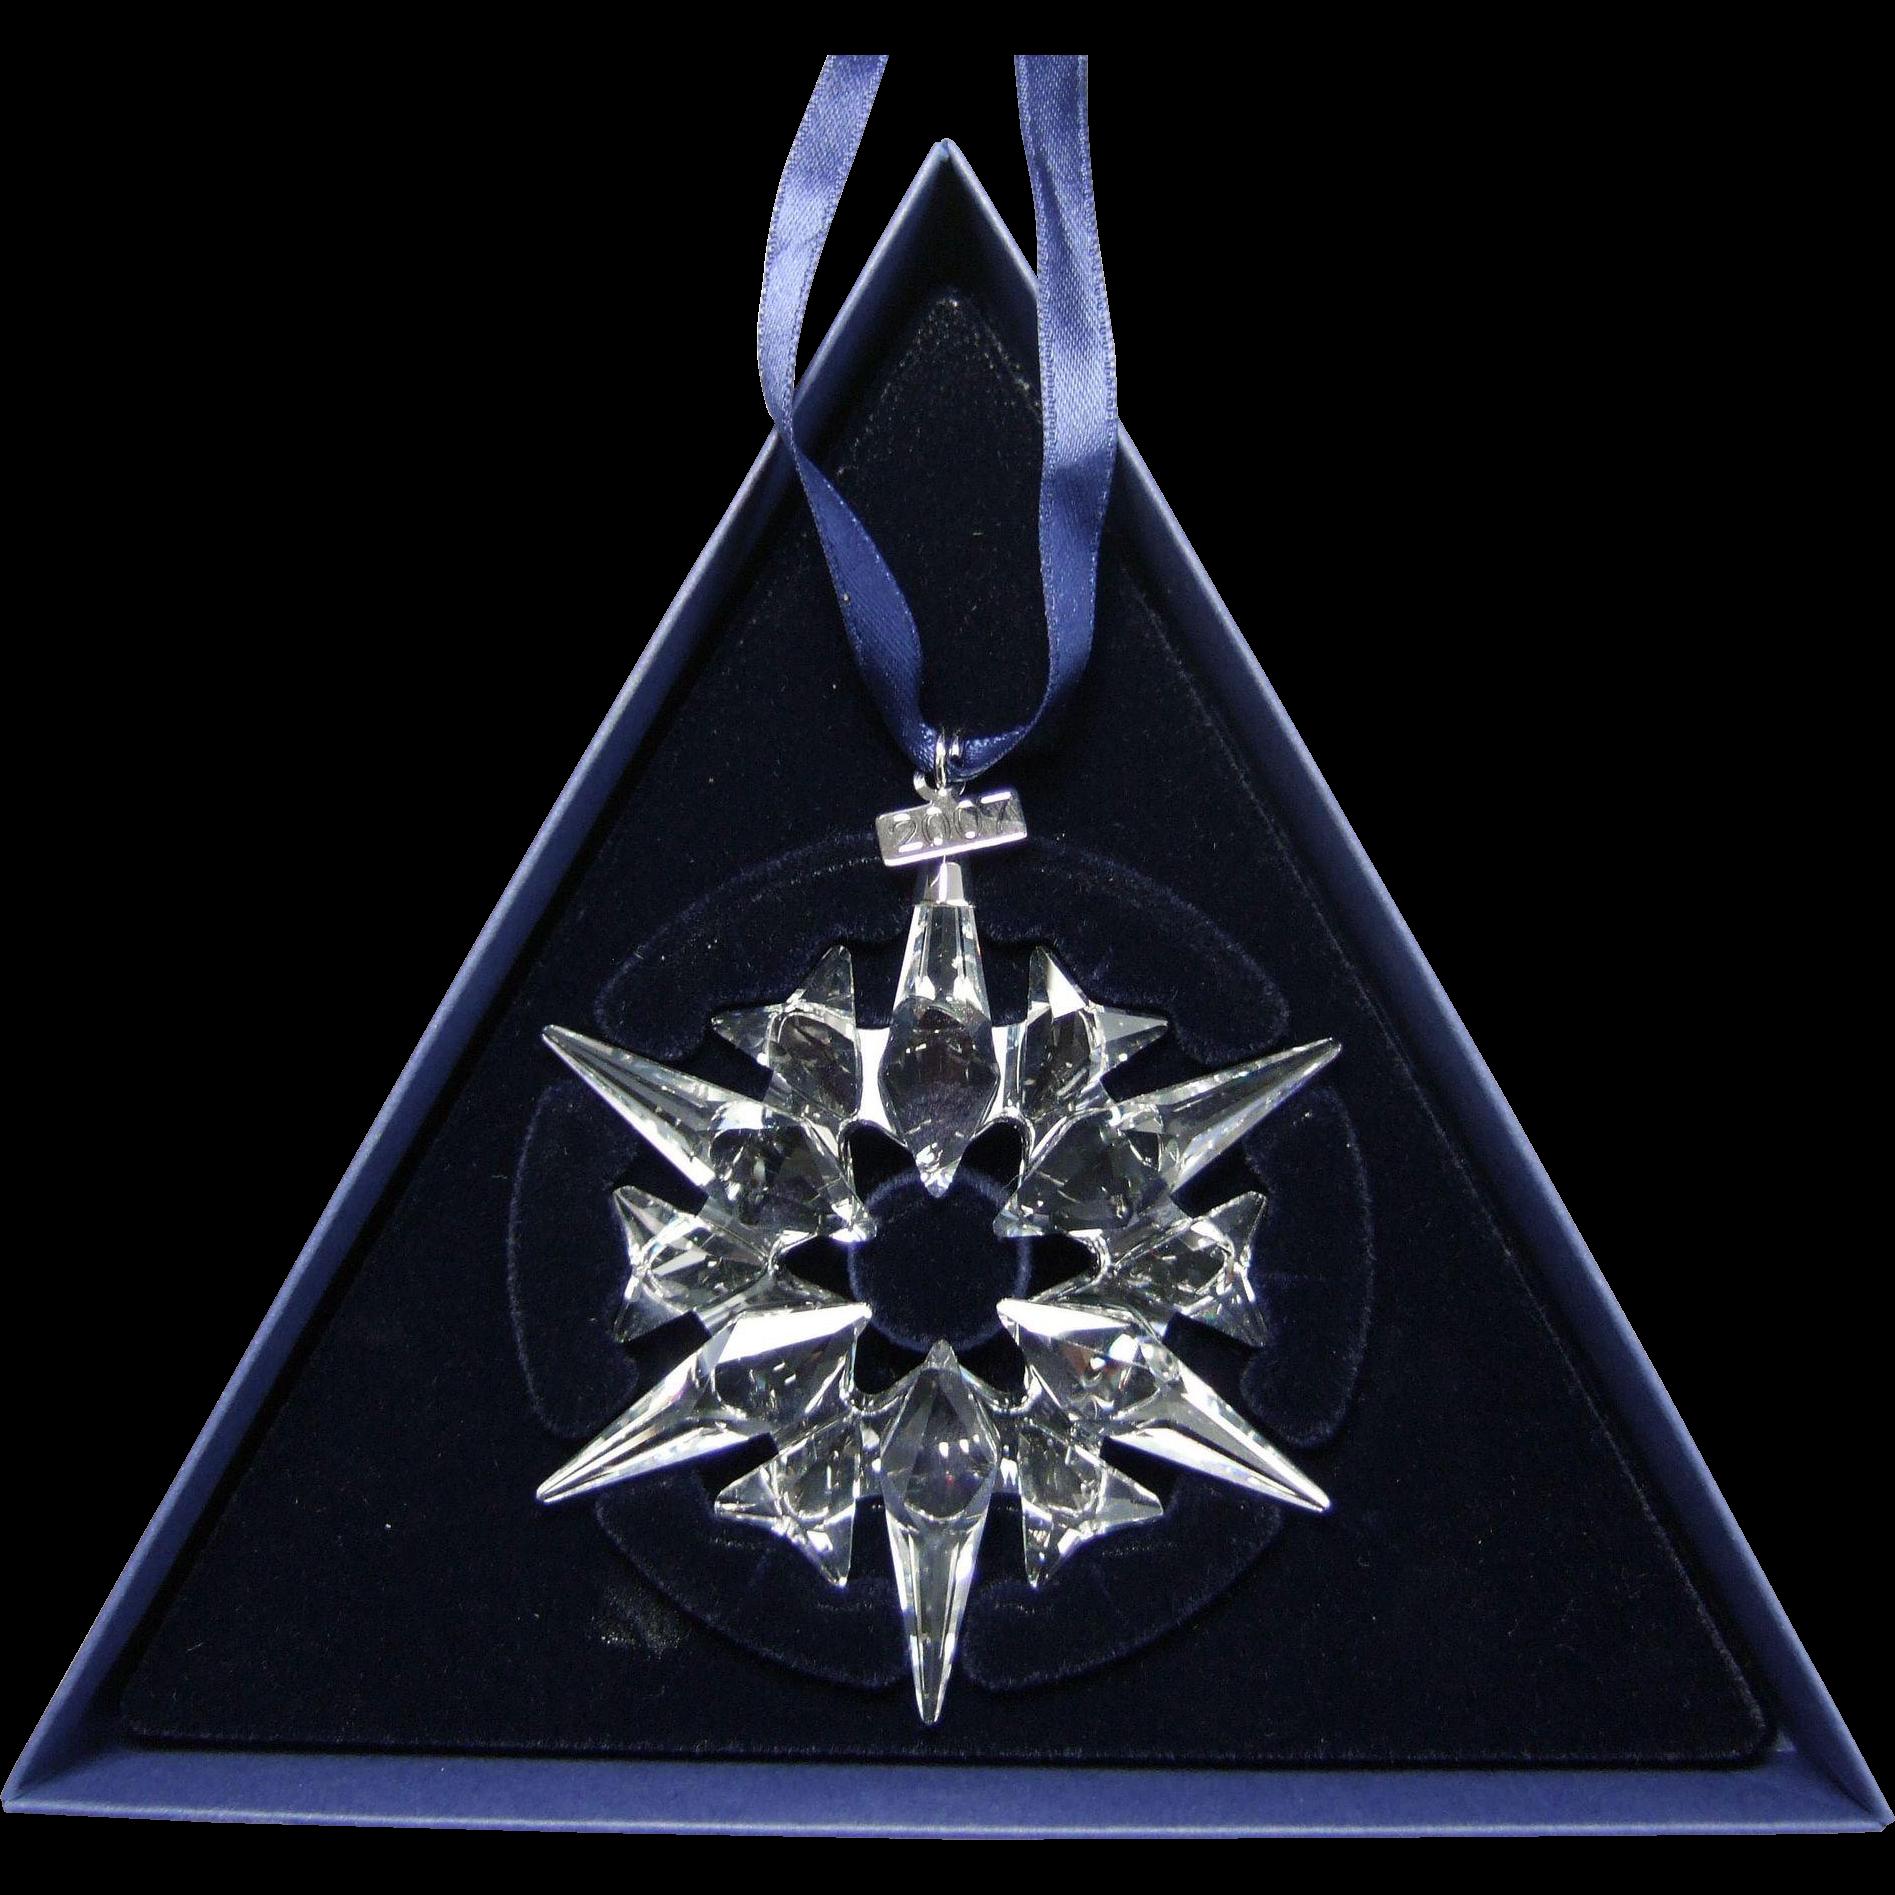 2007 Swarovski Crystal Snowflake Annual Edition Christmas ...